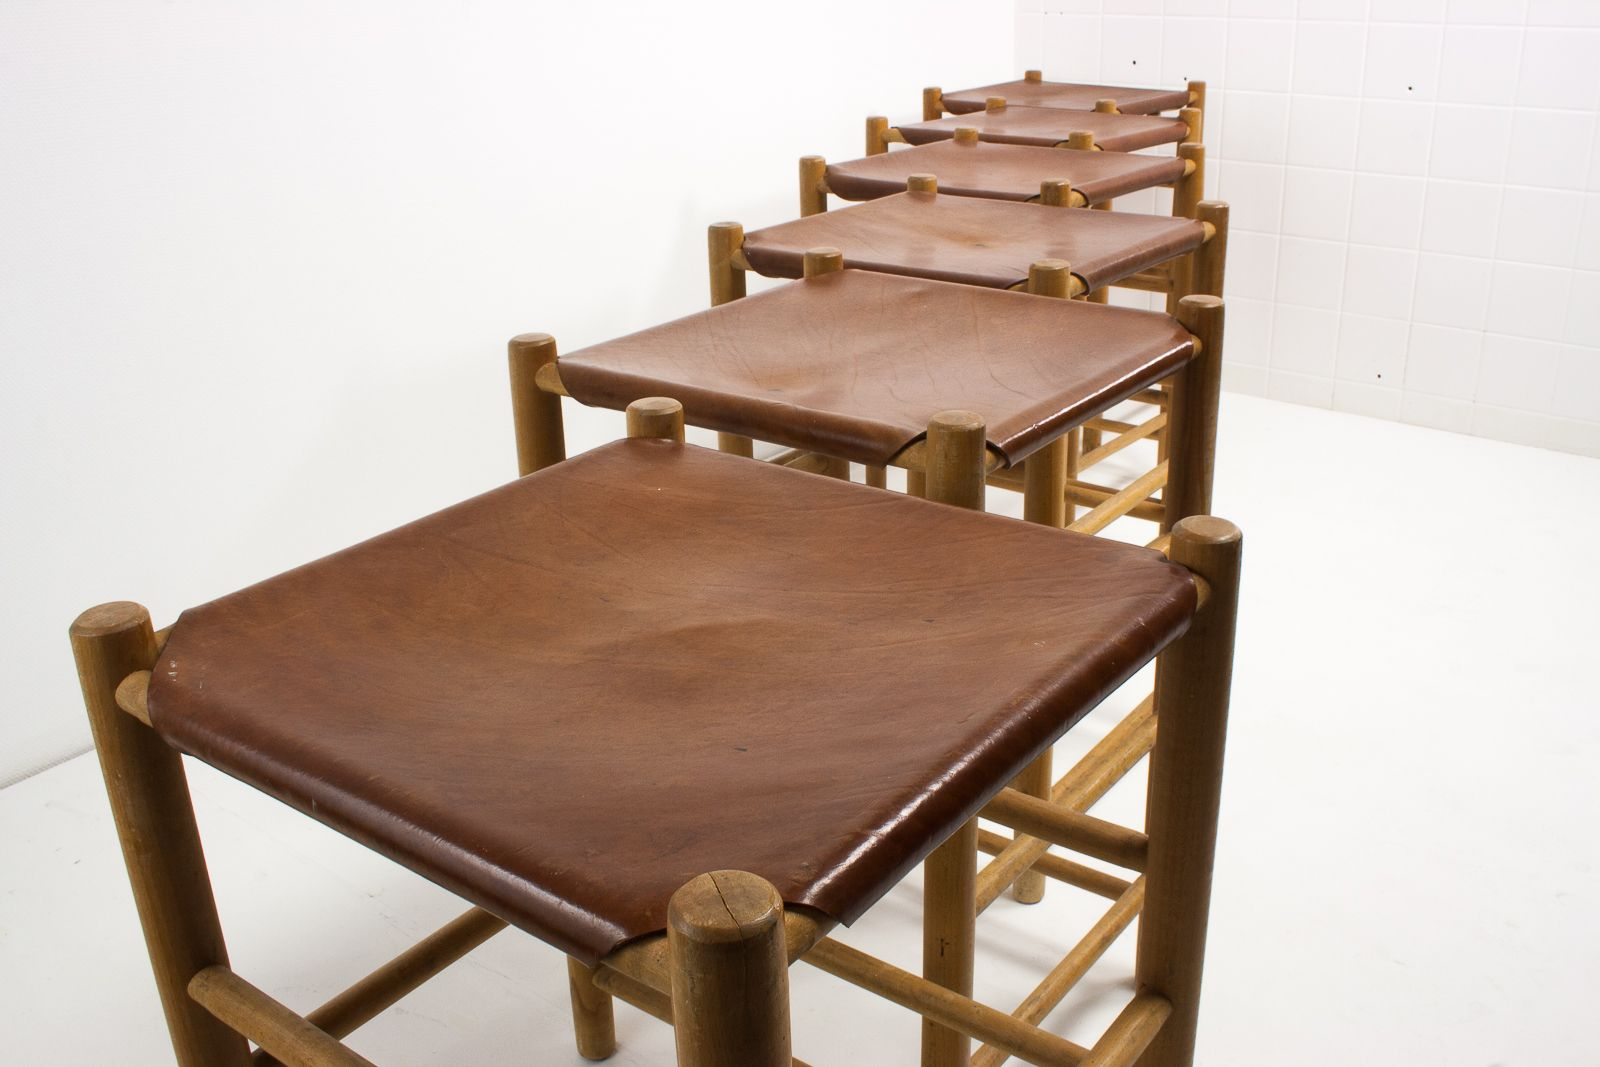 hocker aus birke leder von ate van apeldoorn f r houtwerk hattem 1960er 6er set bei pamono. Black Bedroom Furniture Sets. Home Design Ideas